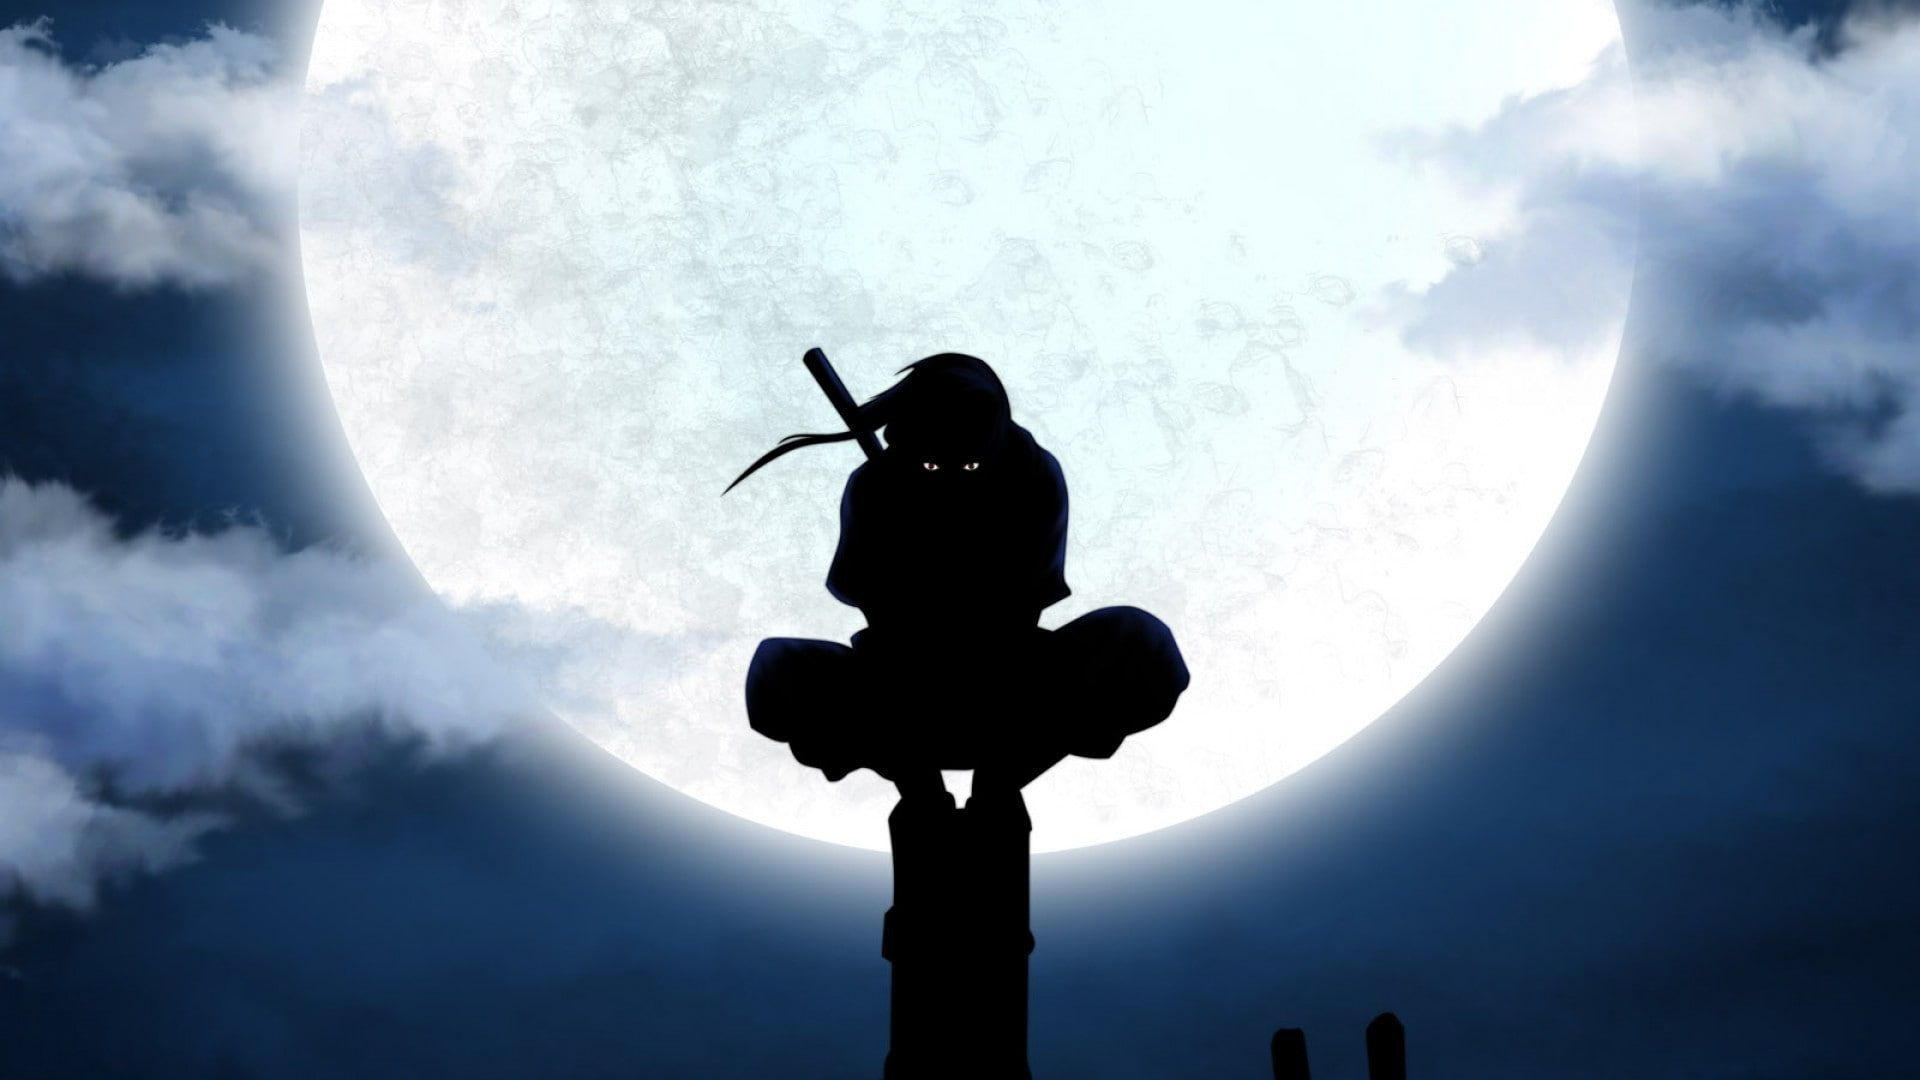 HD wallpaper: silhouette, Naruto Shippuuden, power lines, ANBU, anime, utility pole